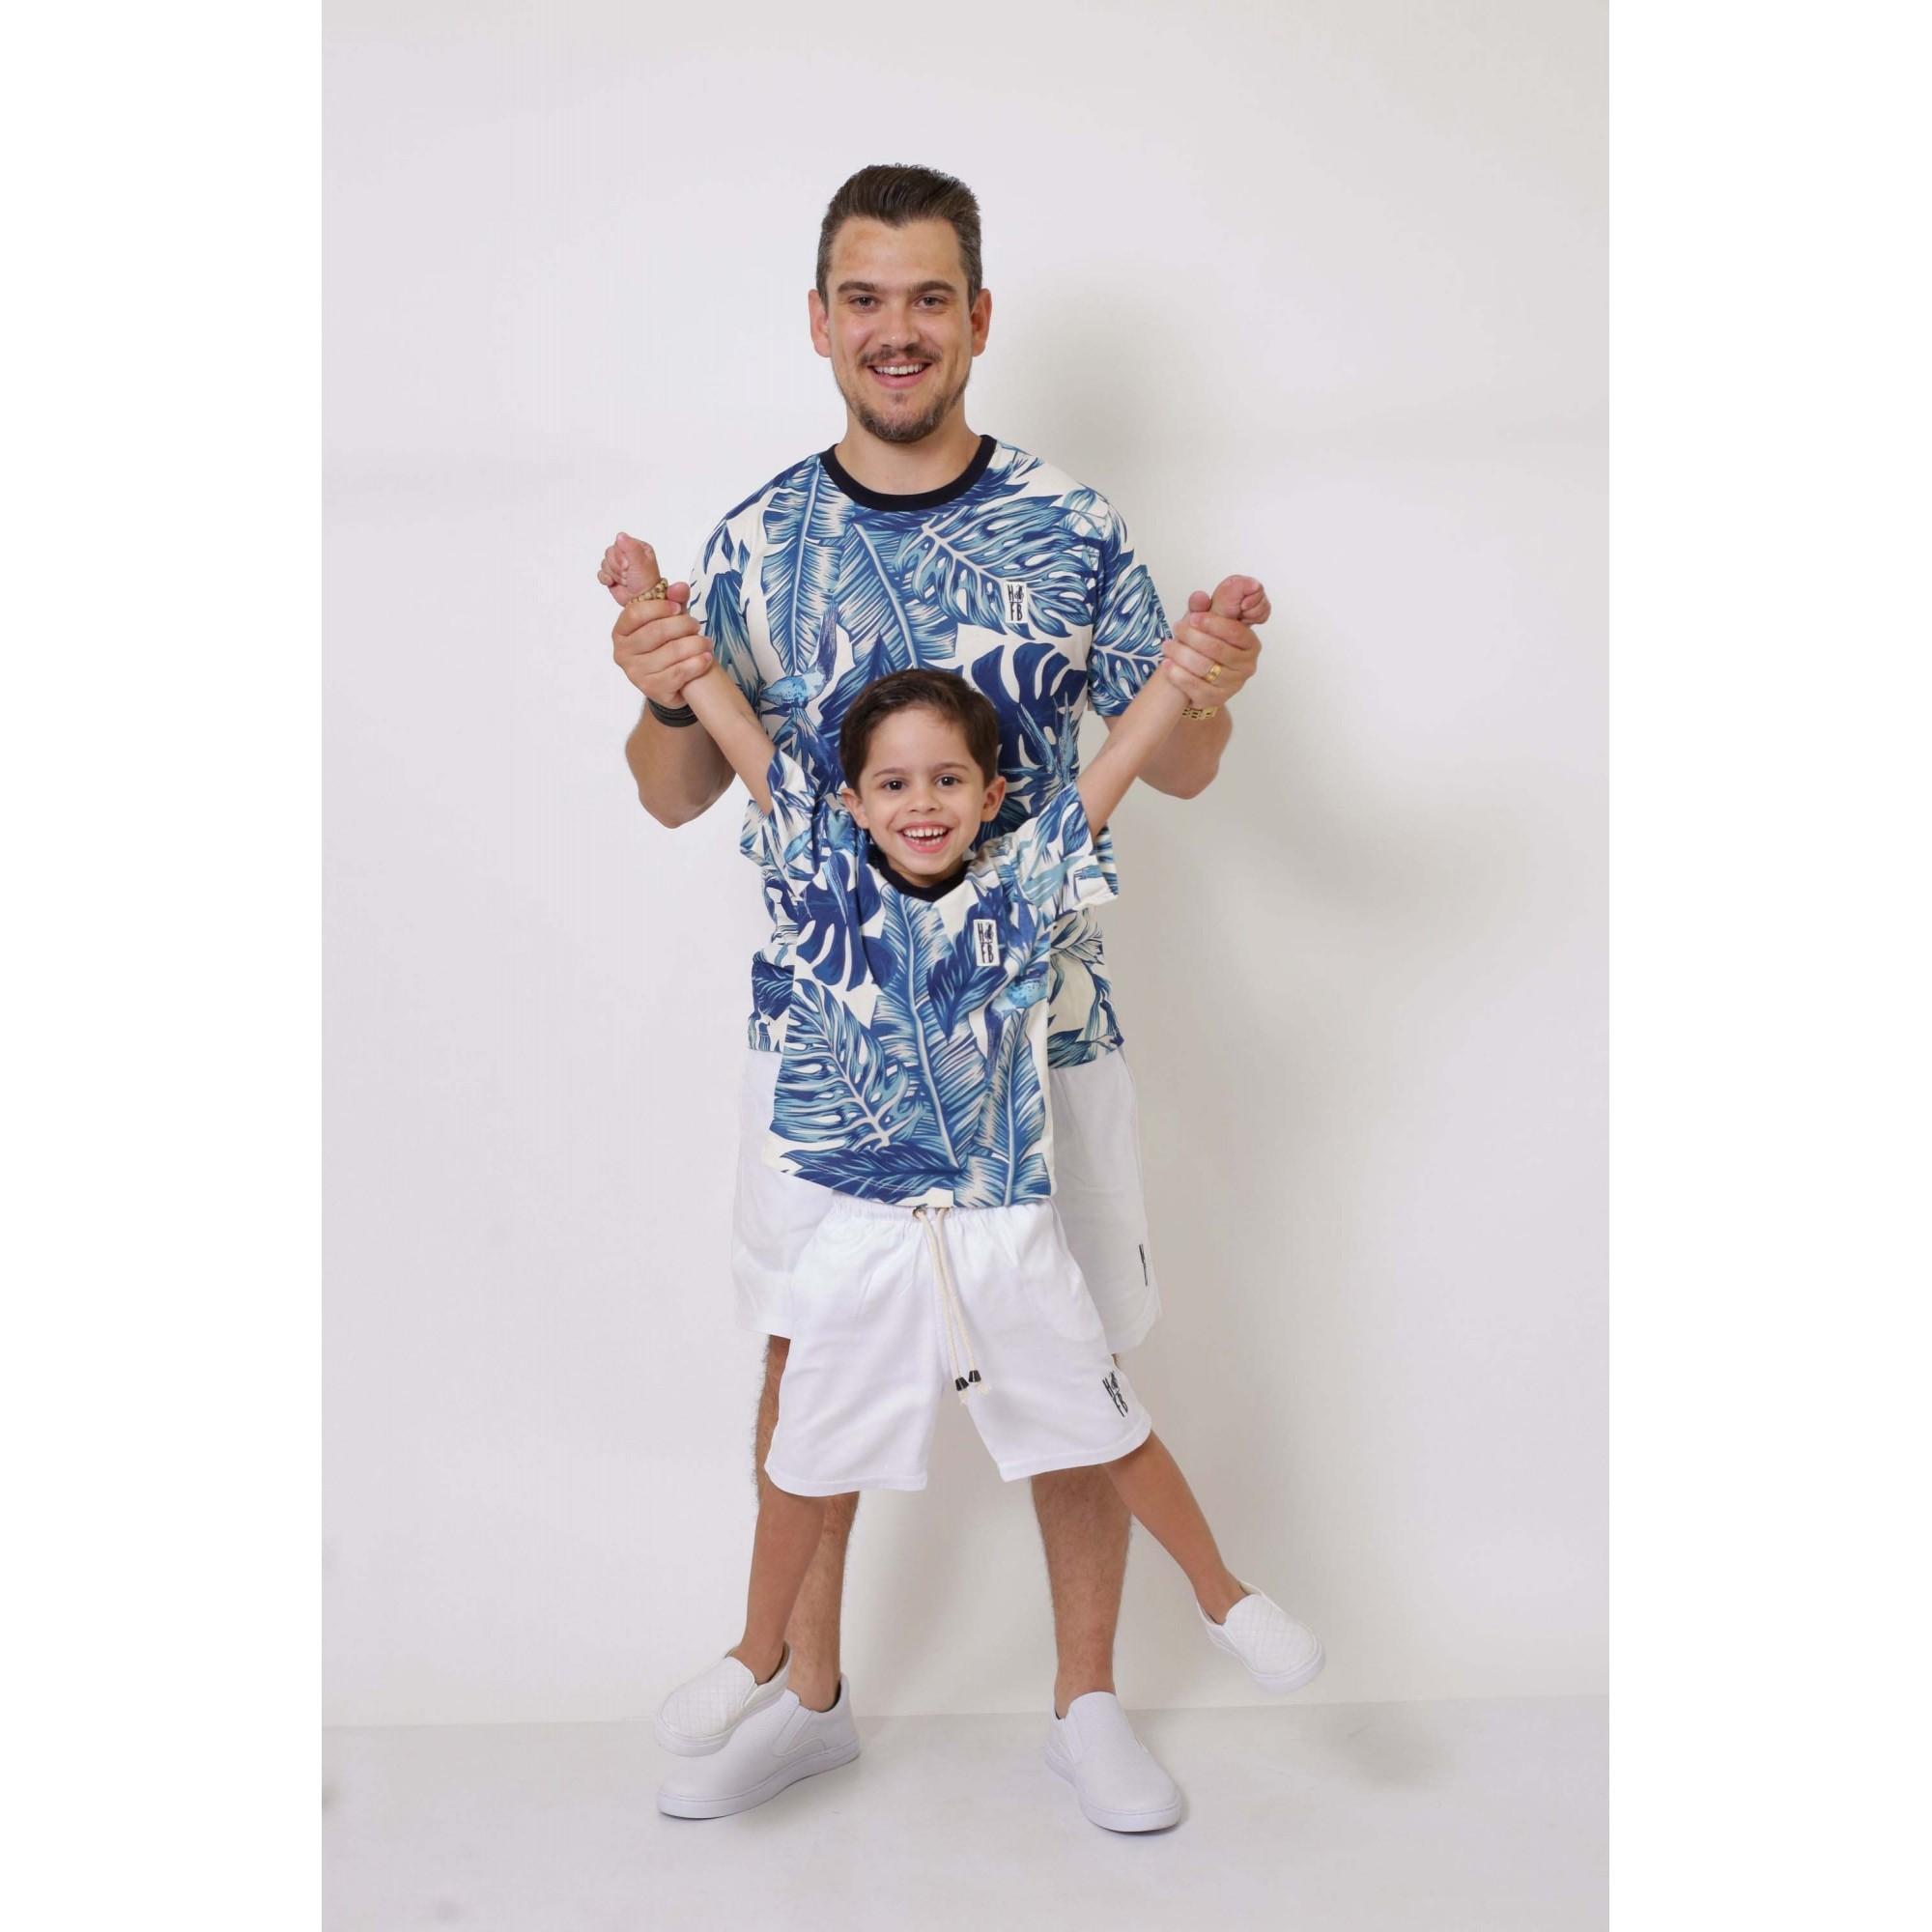 PAI E FILHO > 02 T-Shirts - Caribe  [Coleção Tal Pai Tal Filho]  - Heitor Fashion Brazil